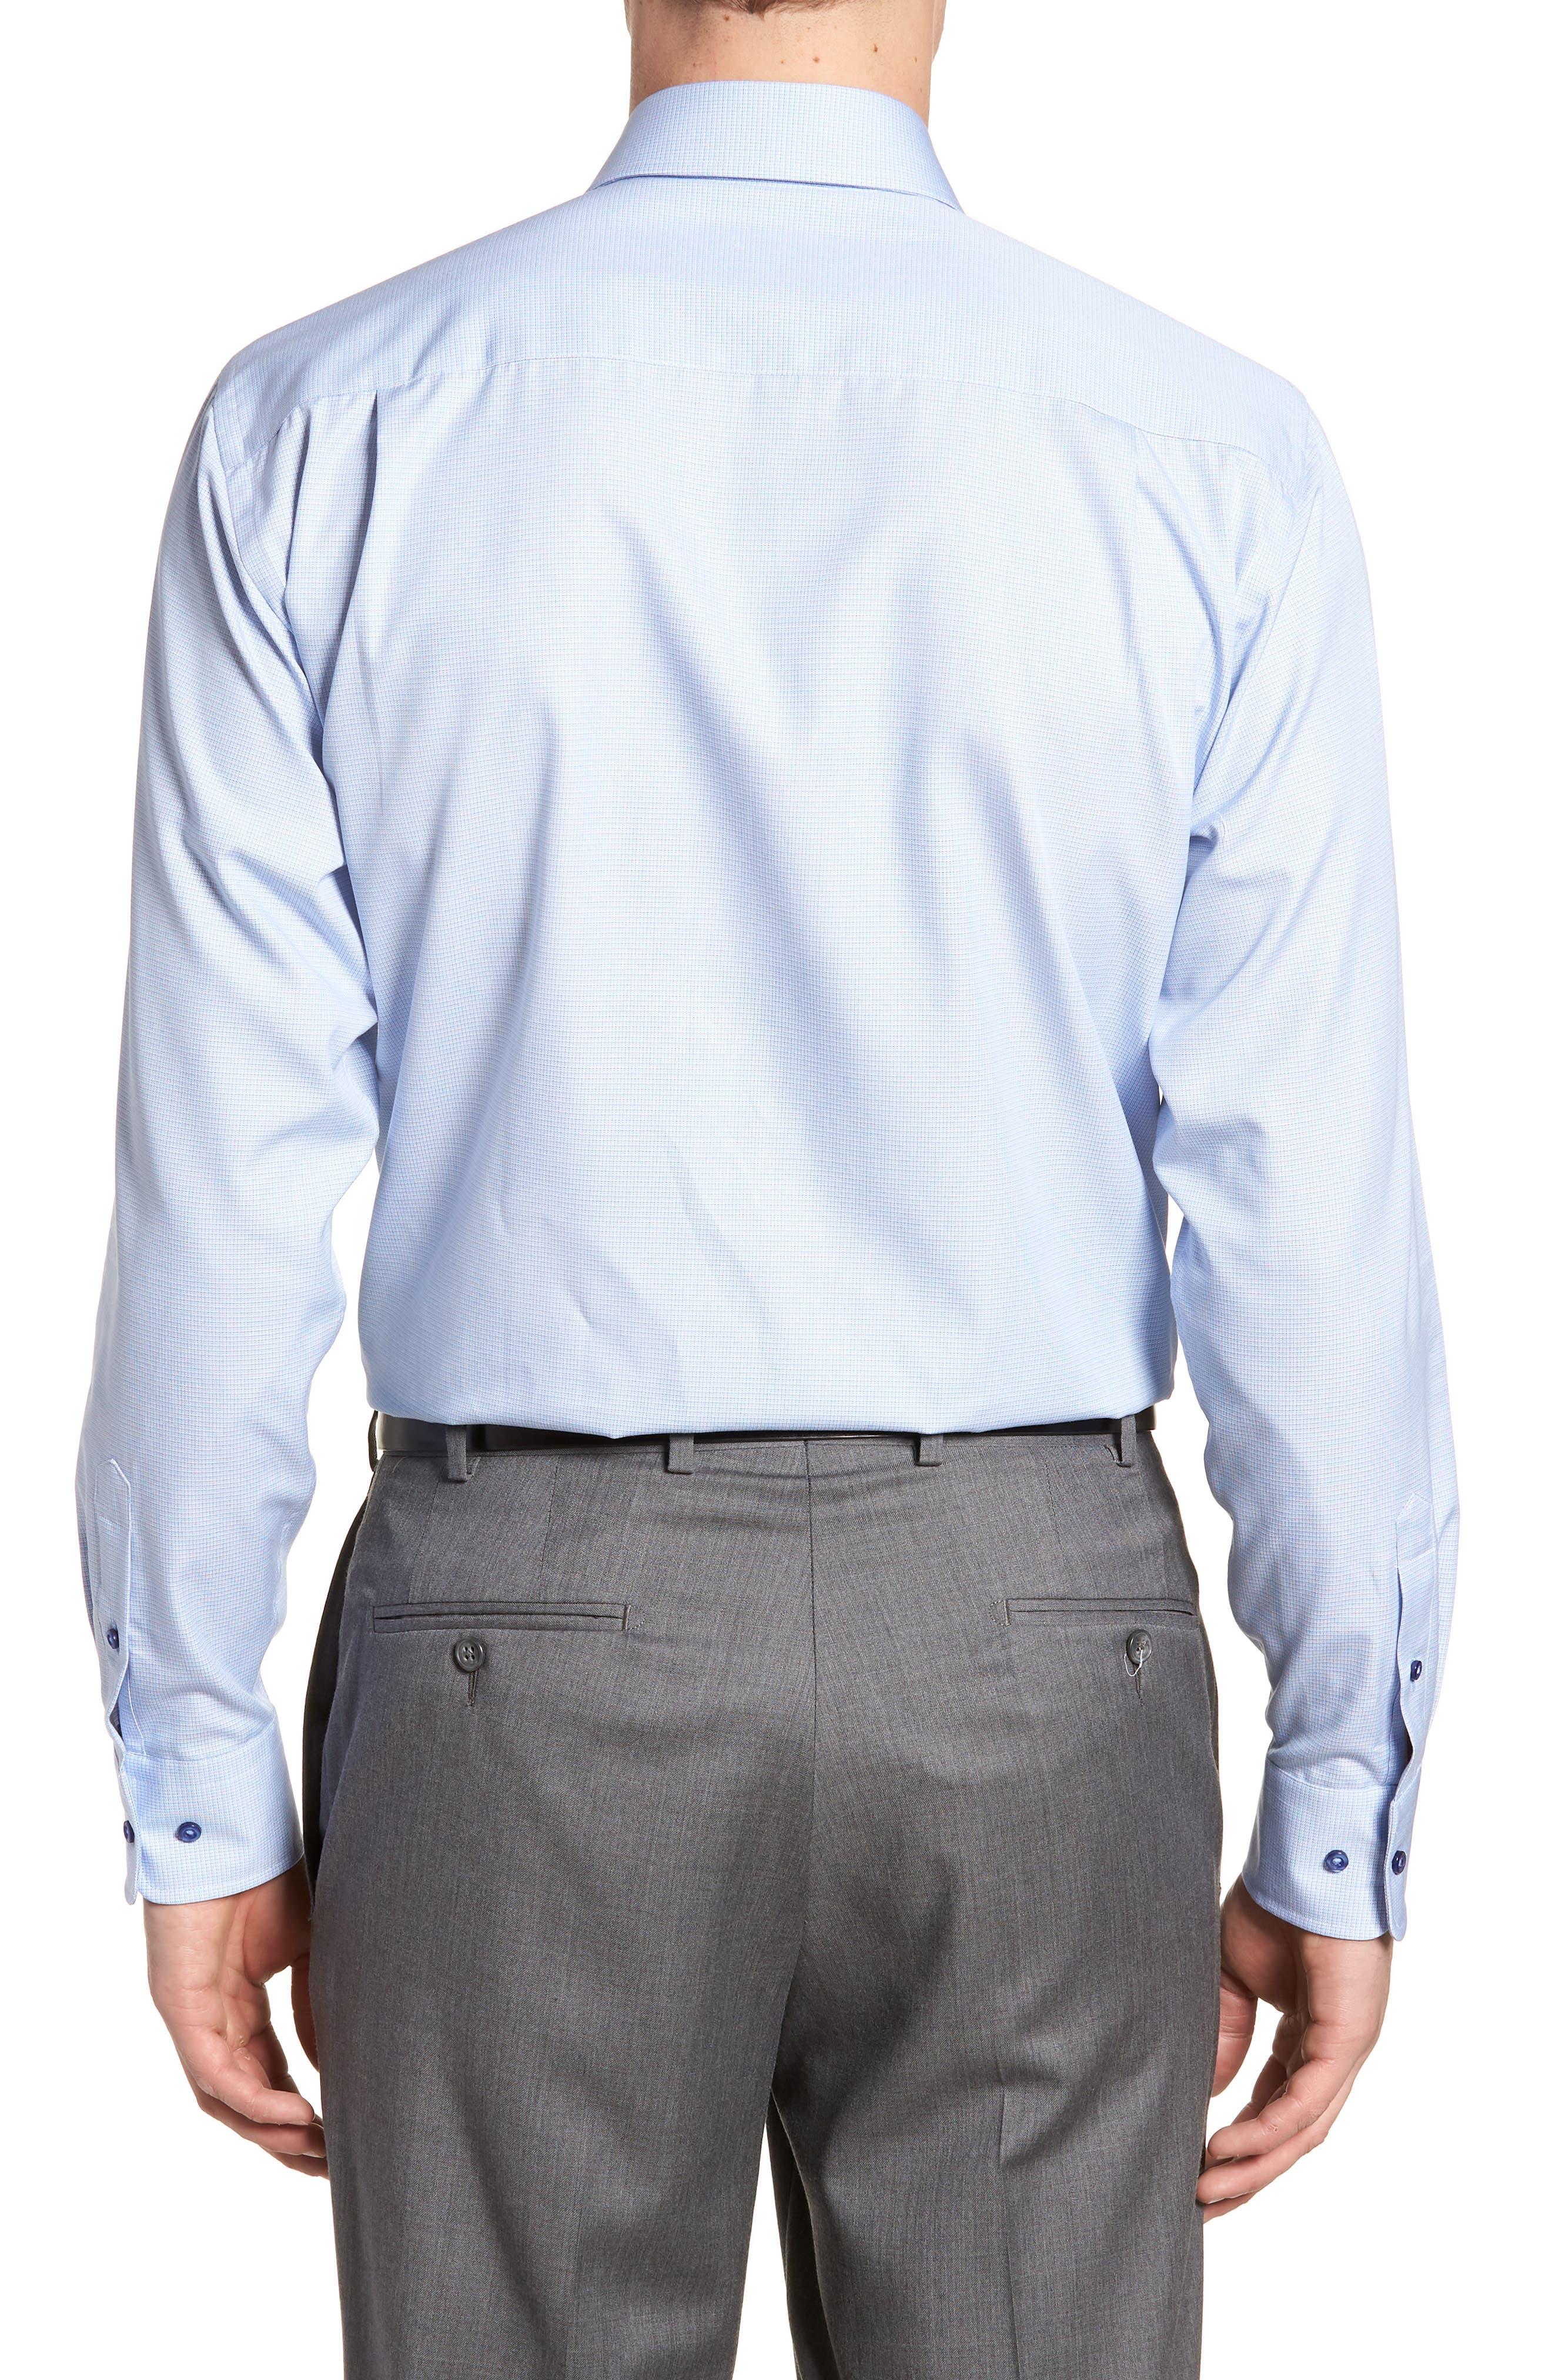 Regular Fit Solid Dress Shirt,                             Alternate thumbnail 3, color,                             Blue